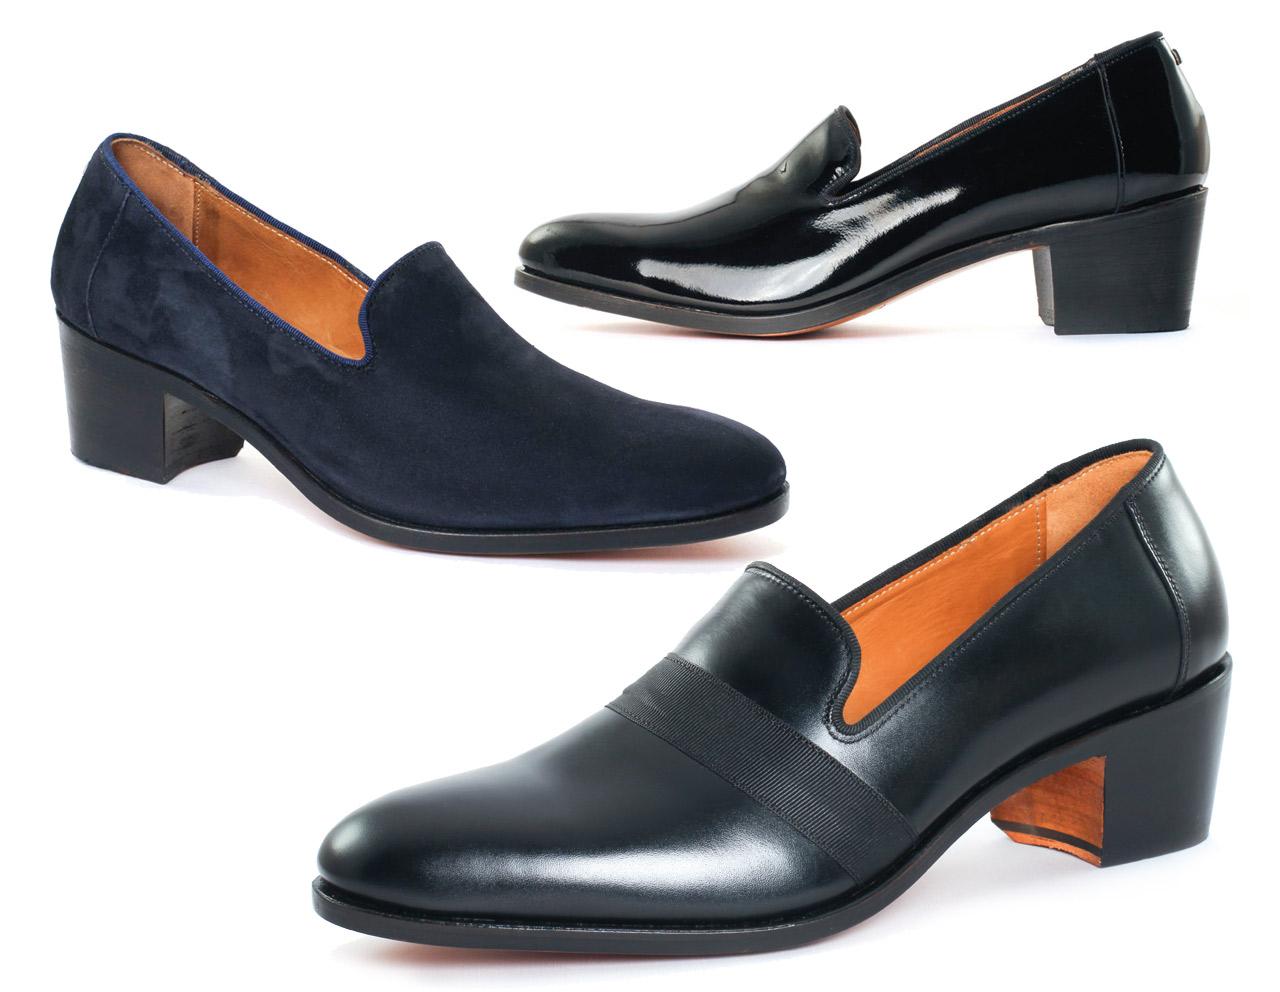 Shoes with high heel for men | LE NÔTRE Royal Navy | Black Patent | Calf Black